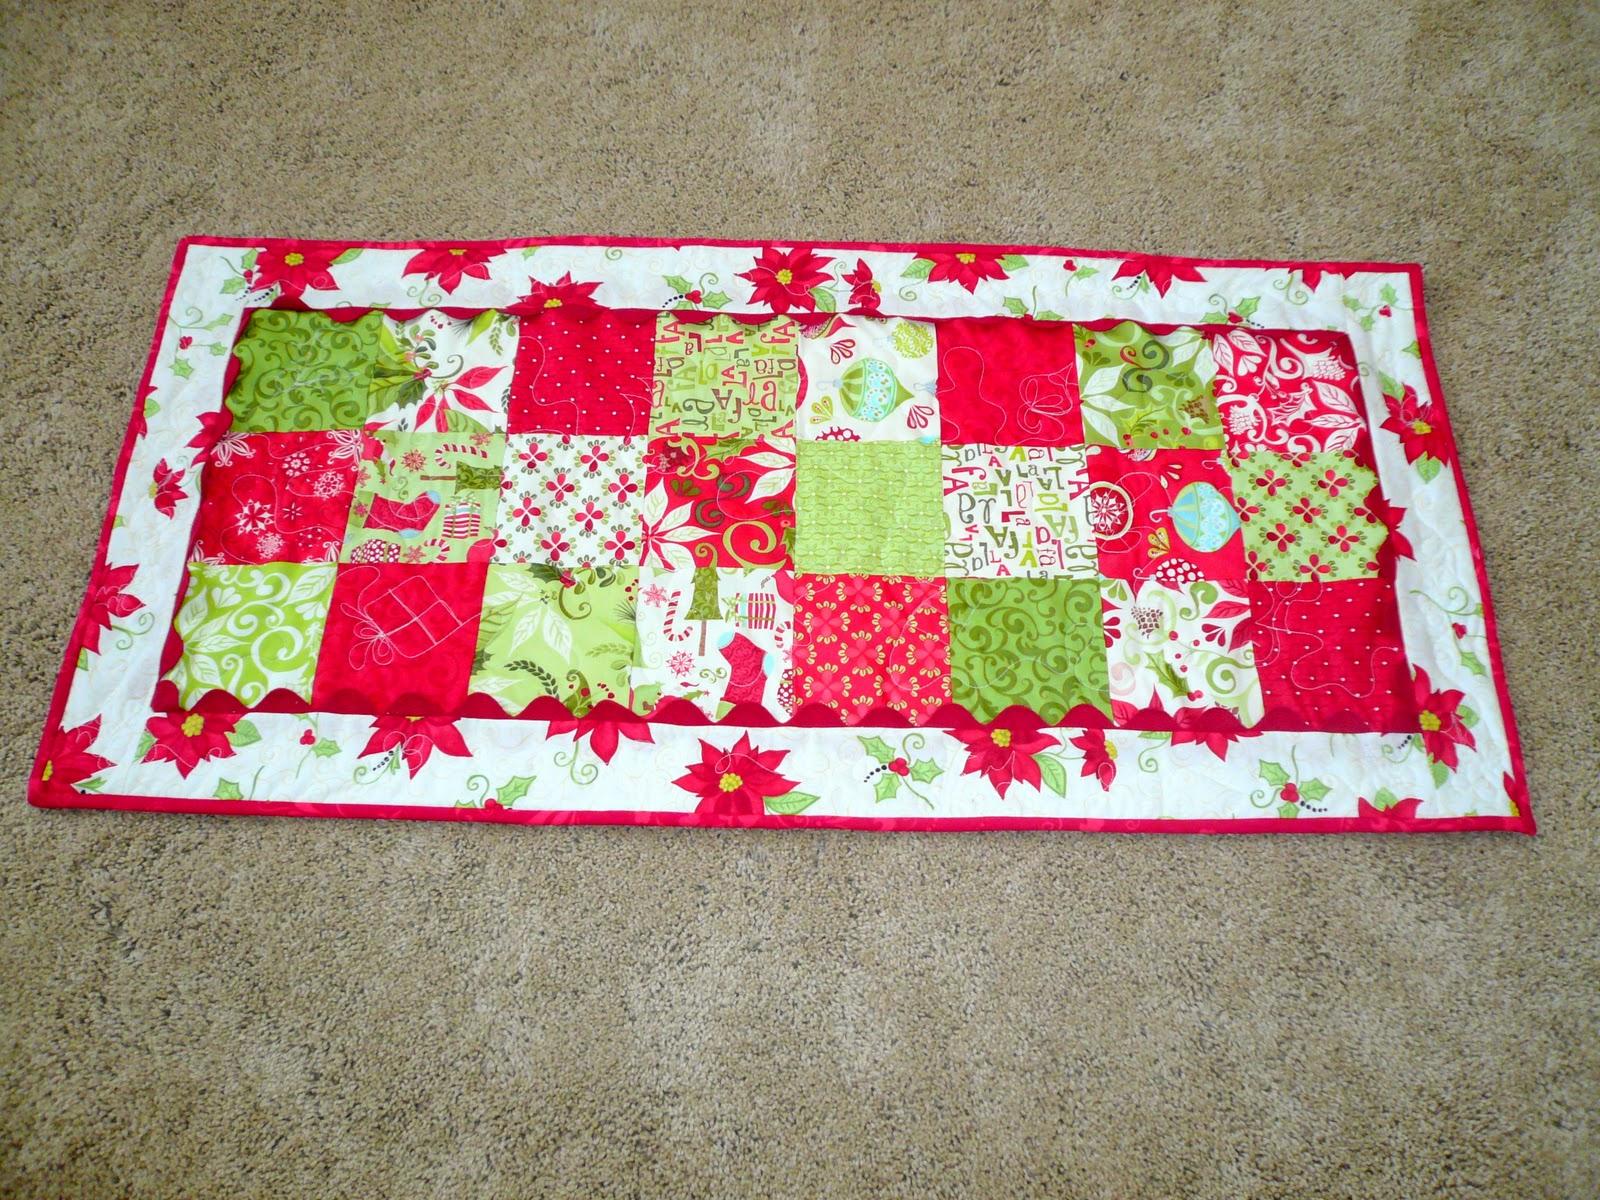 Craftin' Cami: Christmas Table Runner